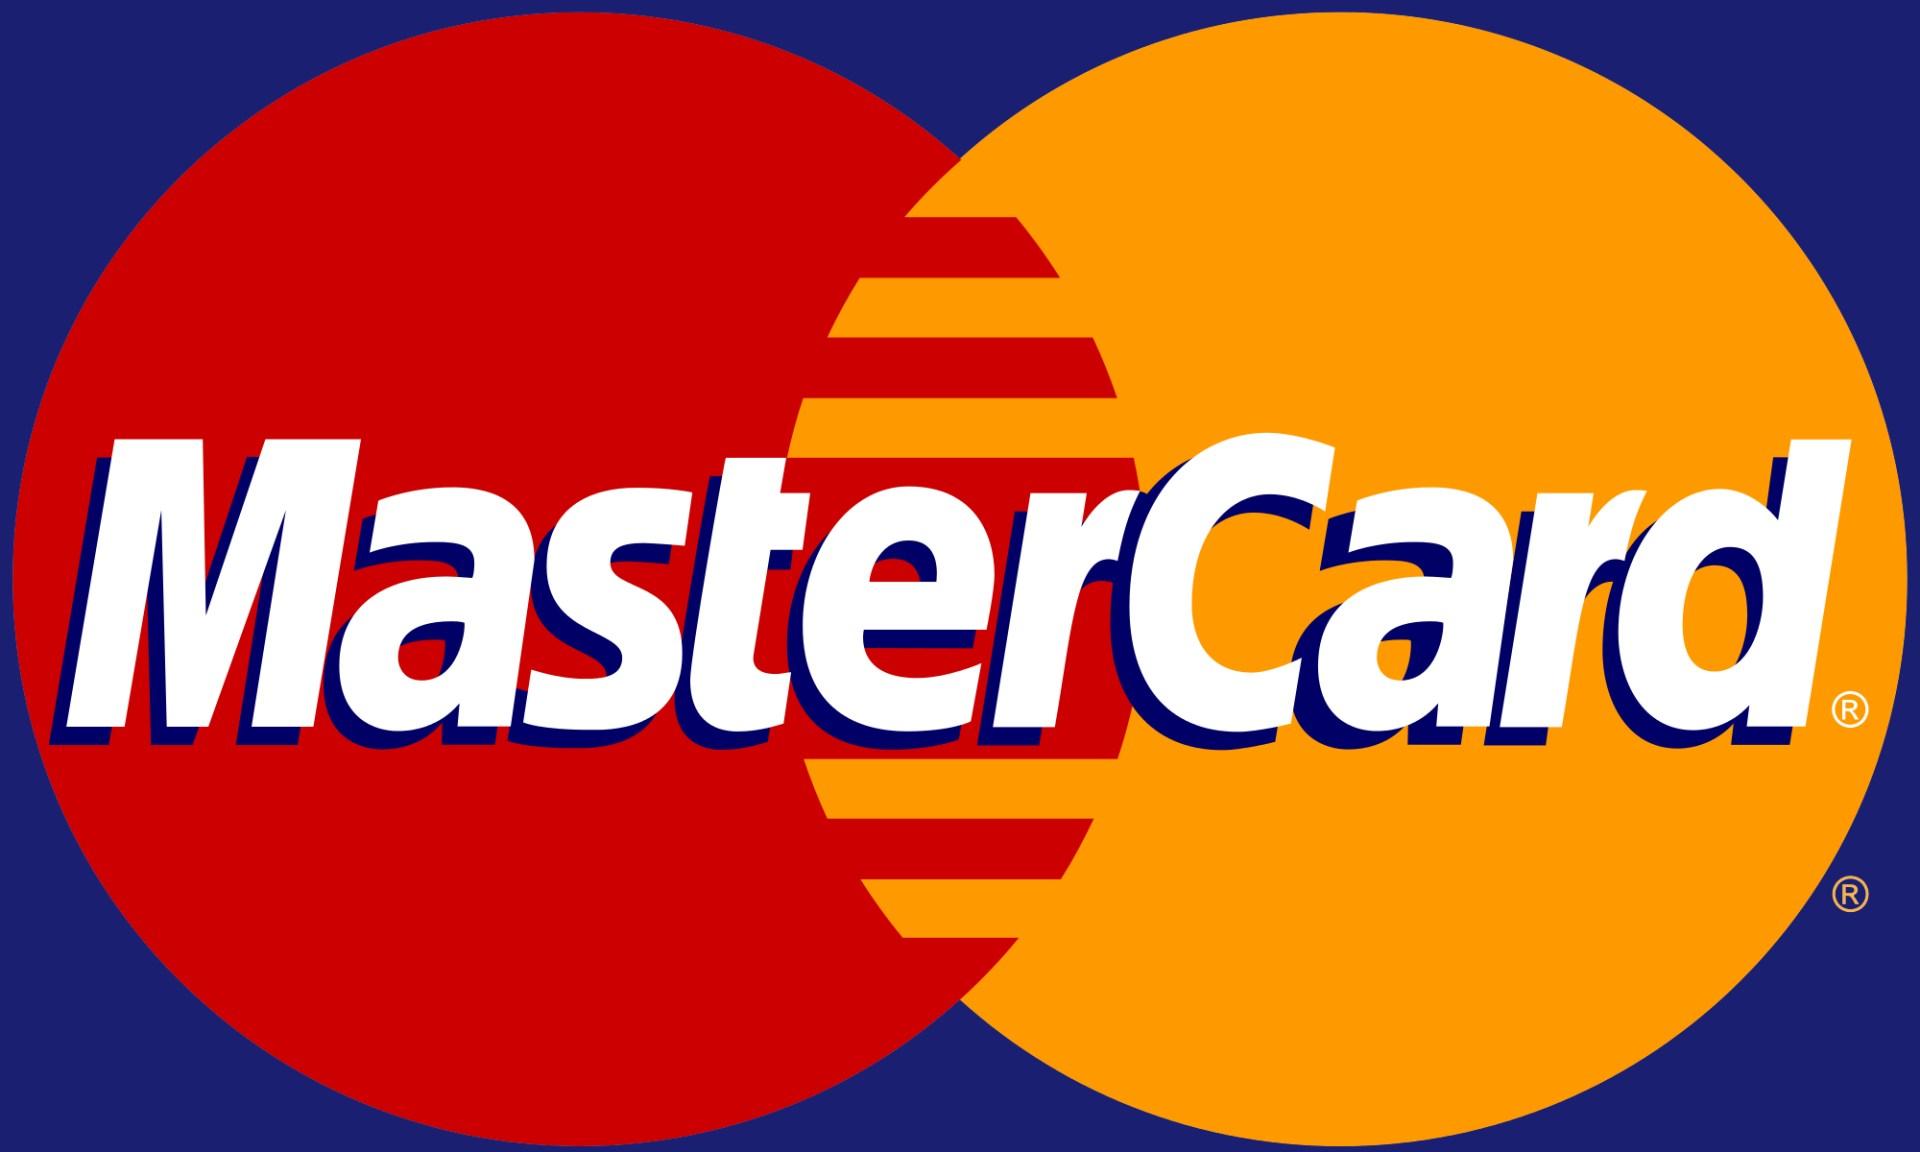 mastercardlogosvg_png